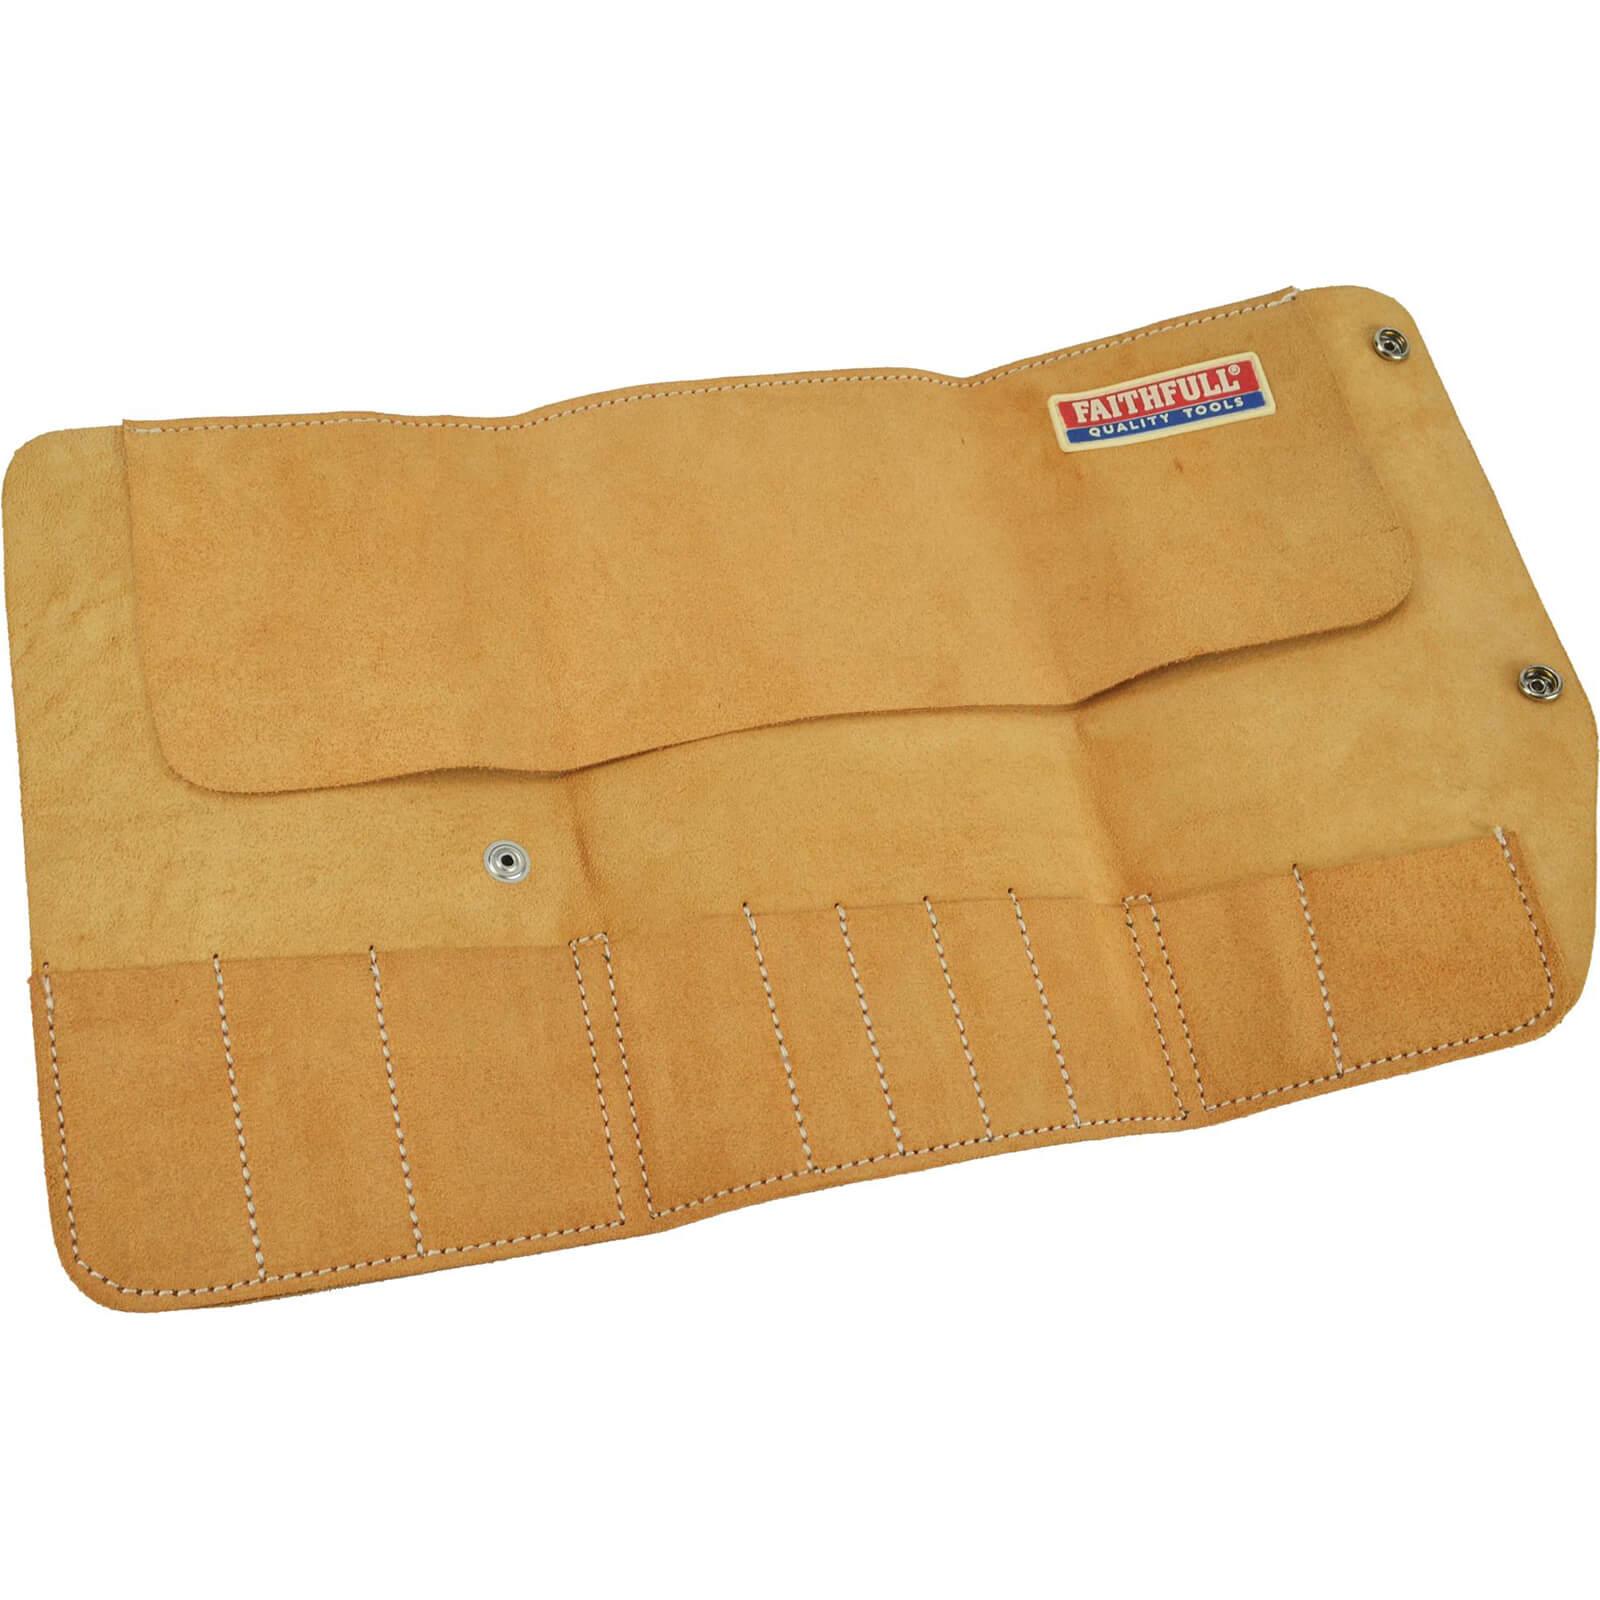 Image of Faithfull 10 Pocket Leather Tool Roll